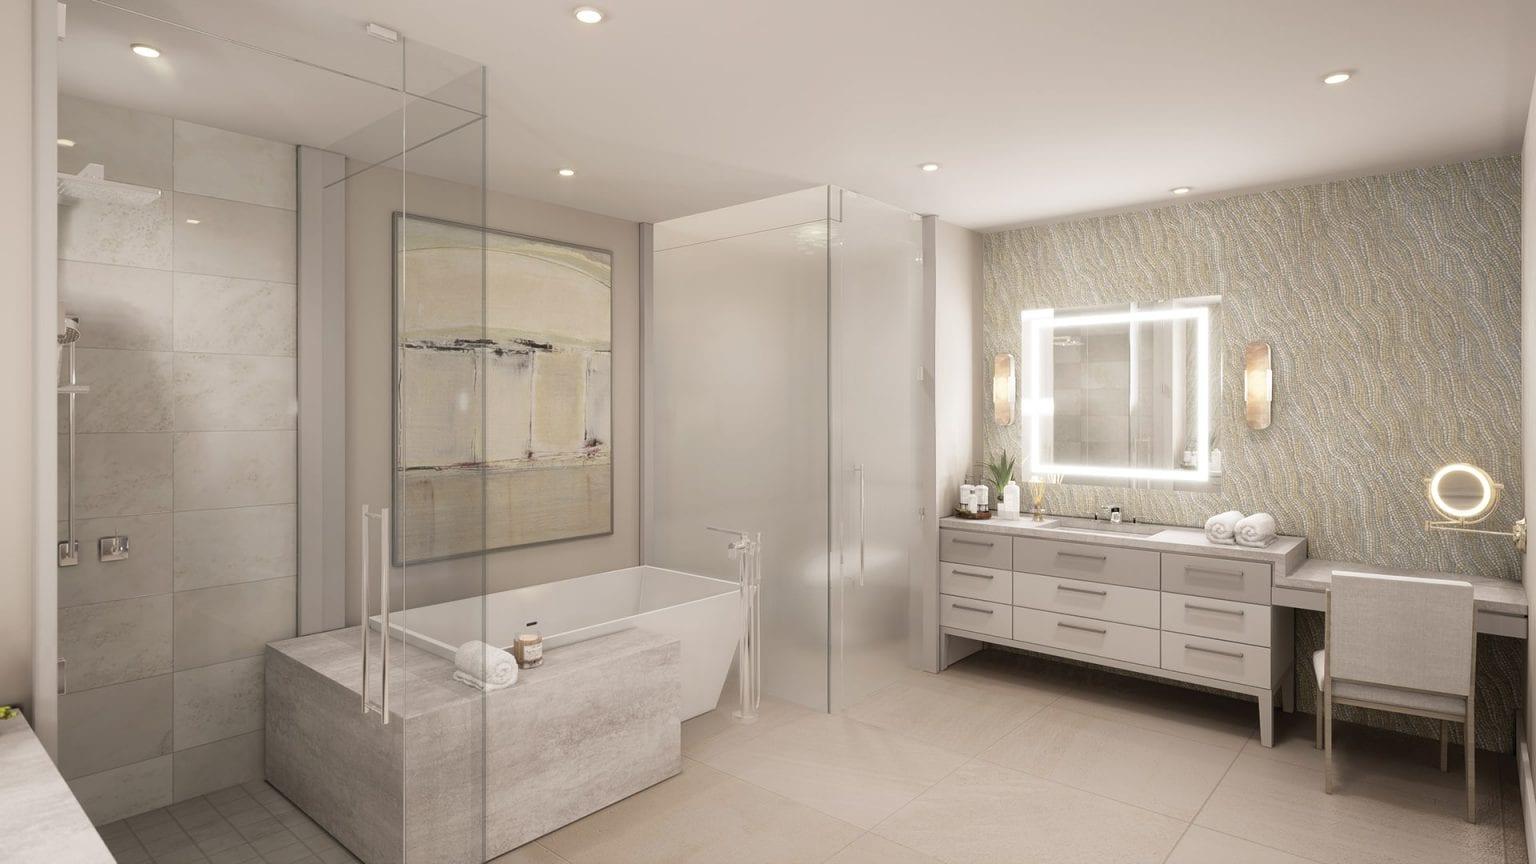 Bateau Plans 5 & 8 Master Bath Rendering at The St Regis Longboat Key Resort